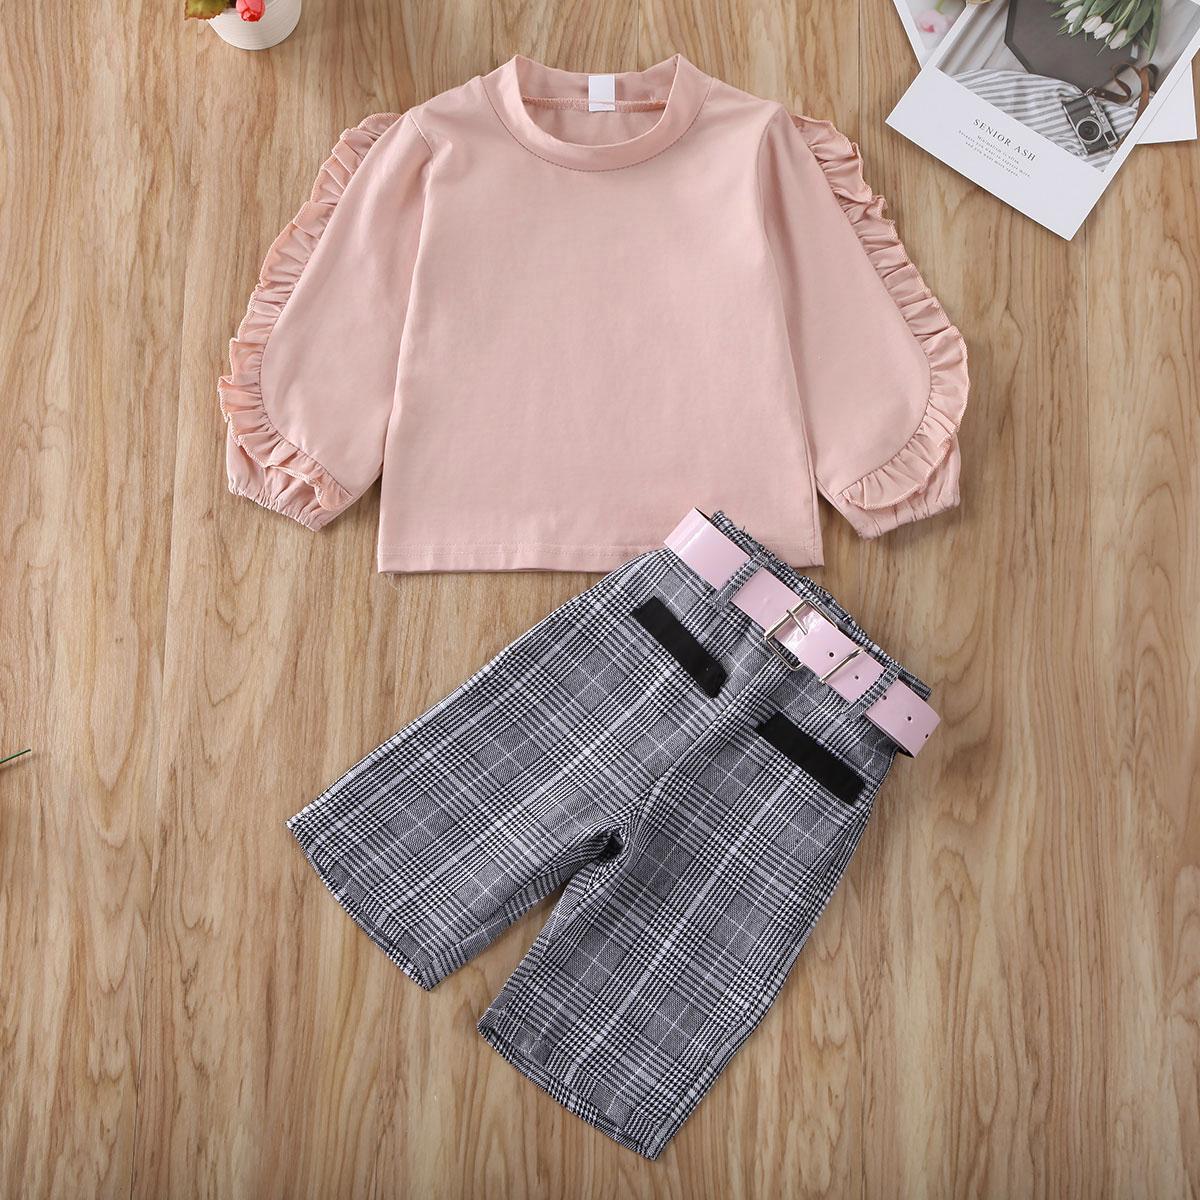 Pudcoco Kleinkind-Baby-Kleidung Solid Color Langarm Rüschen Tops Plaids kurze Hosen Gürtel 2Pcs Outfit Baumwollkleidung Set